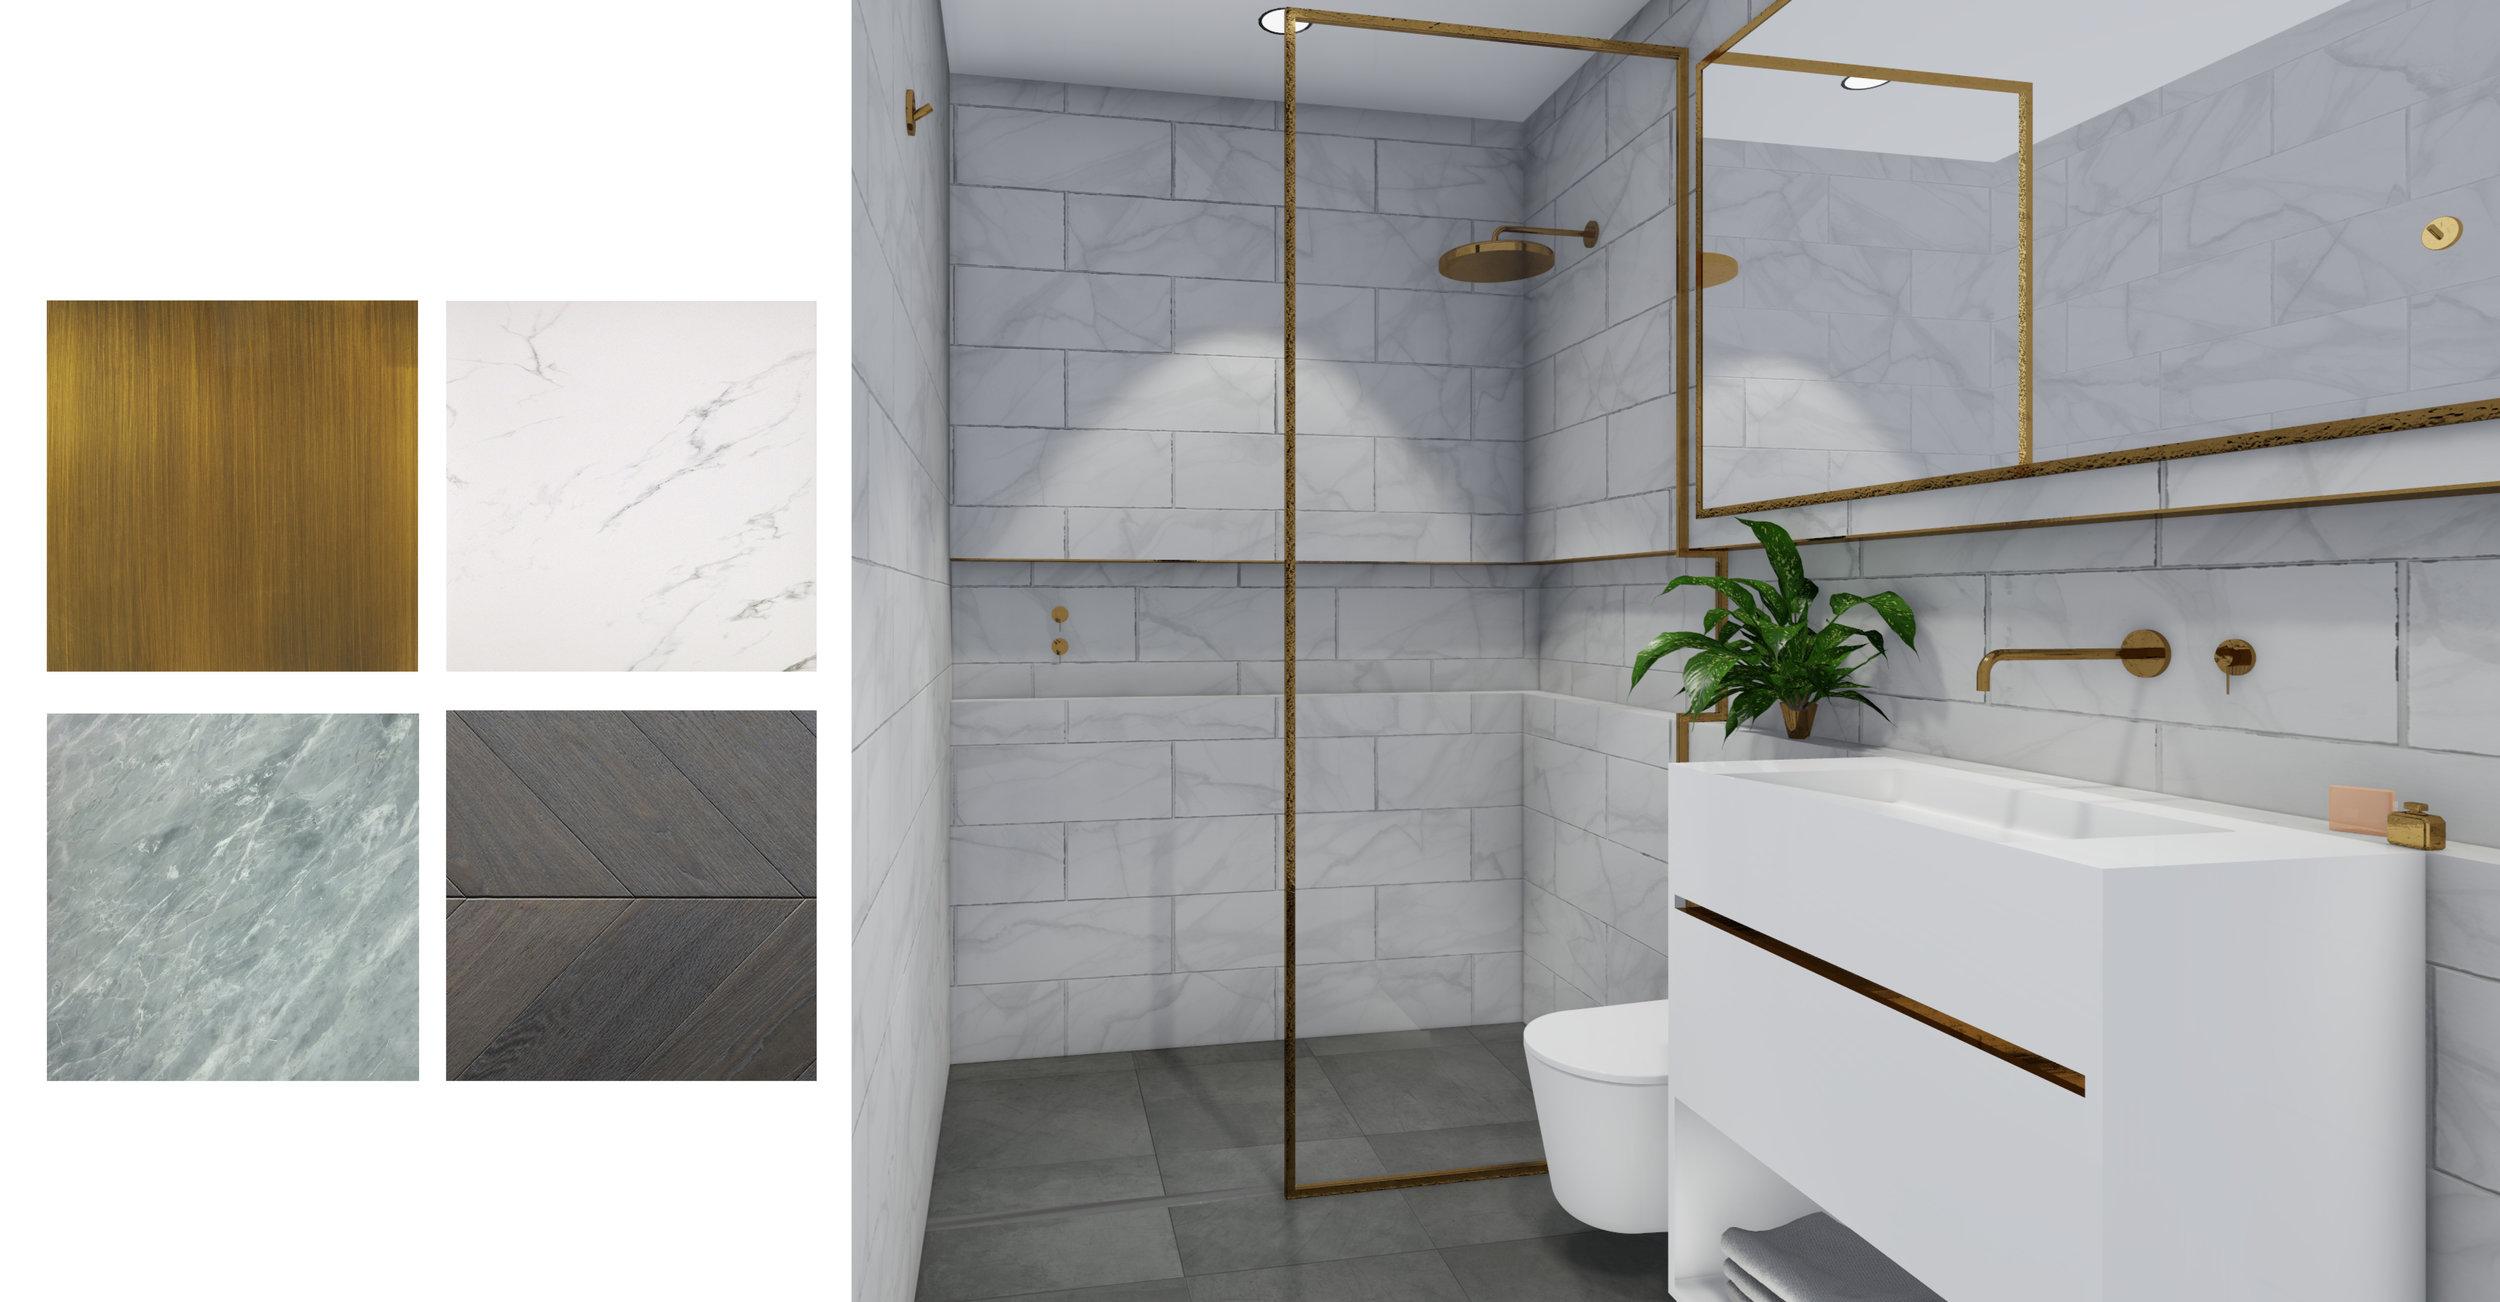 © Copyright Studio DS 2018 - the Multi Home Smart Home Interior Design 3